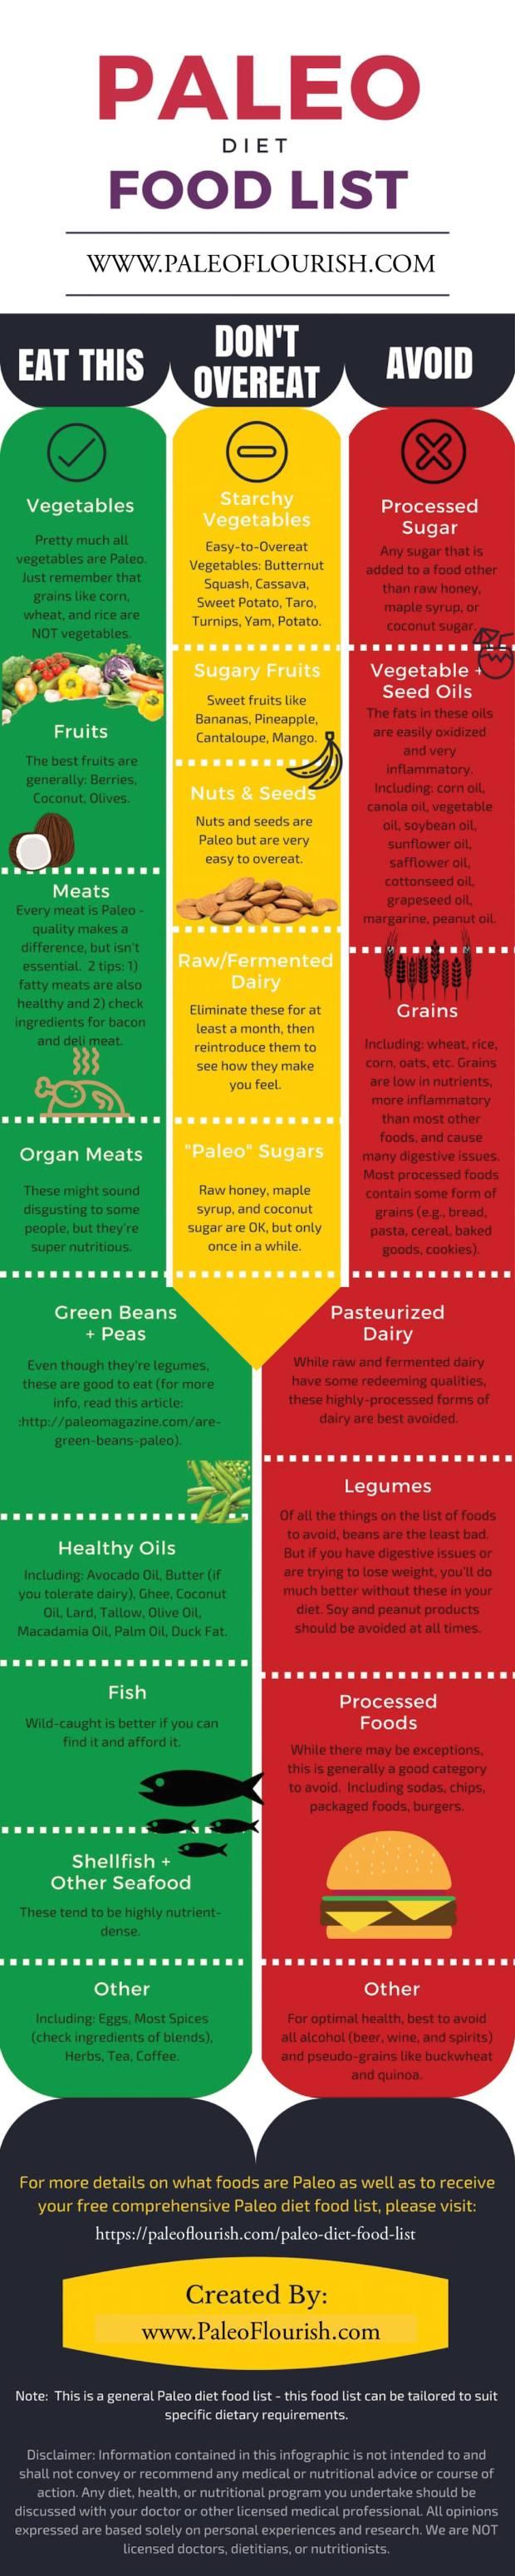 paleo diet foods list • real life eats